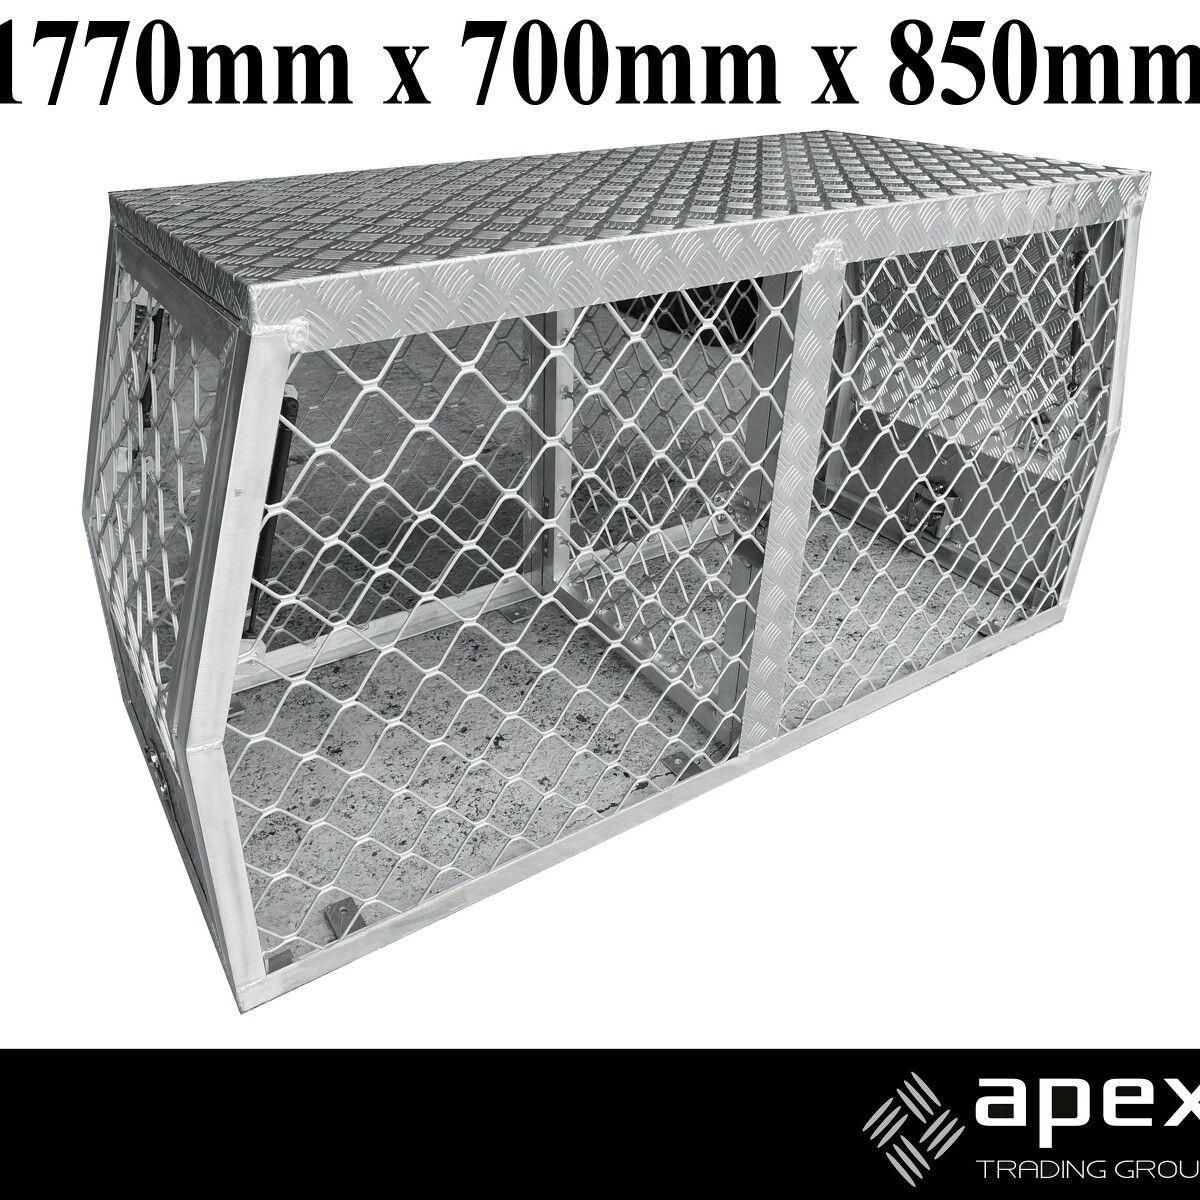 Ute Aluminium Dog Cage Apextrading Com Au Dog Cages Puppy Safe Dog Box